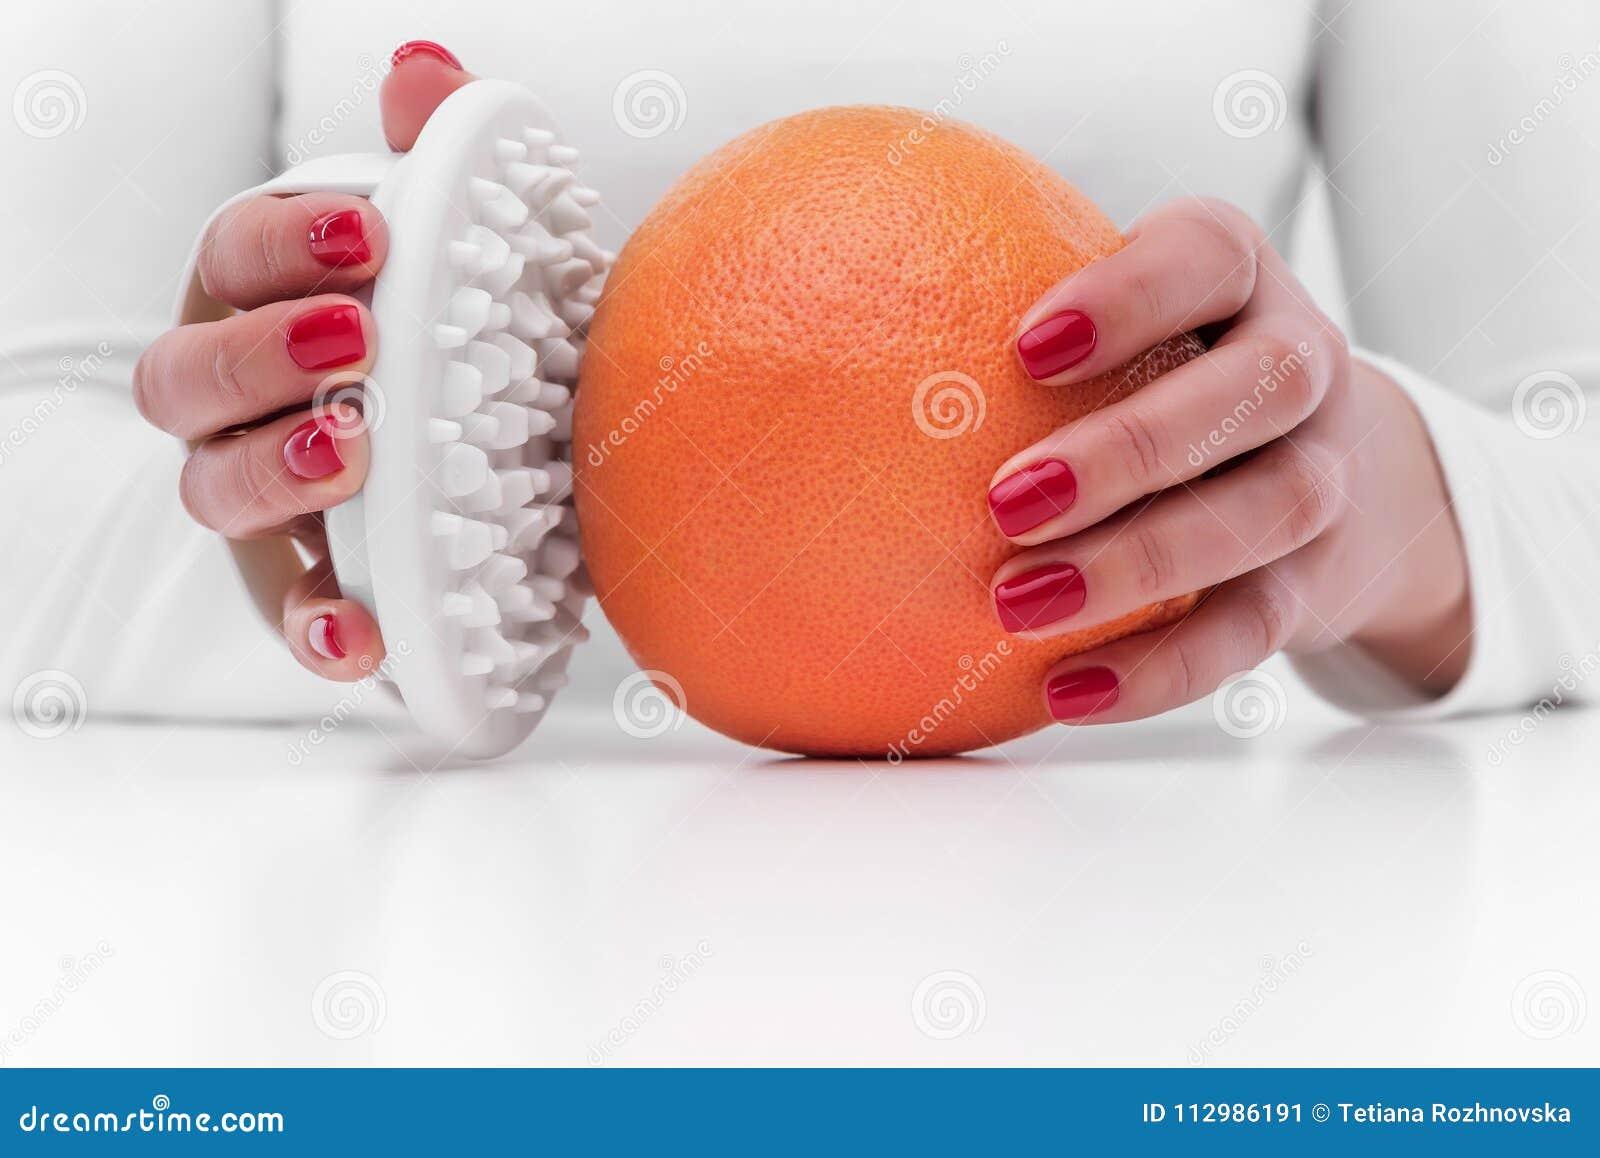 Anti-cellulite massager and orange.